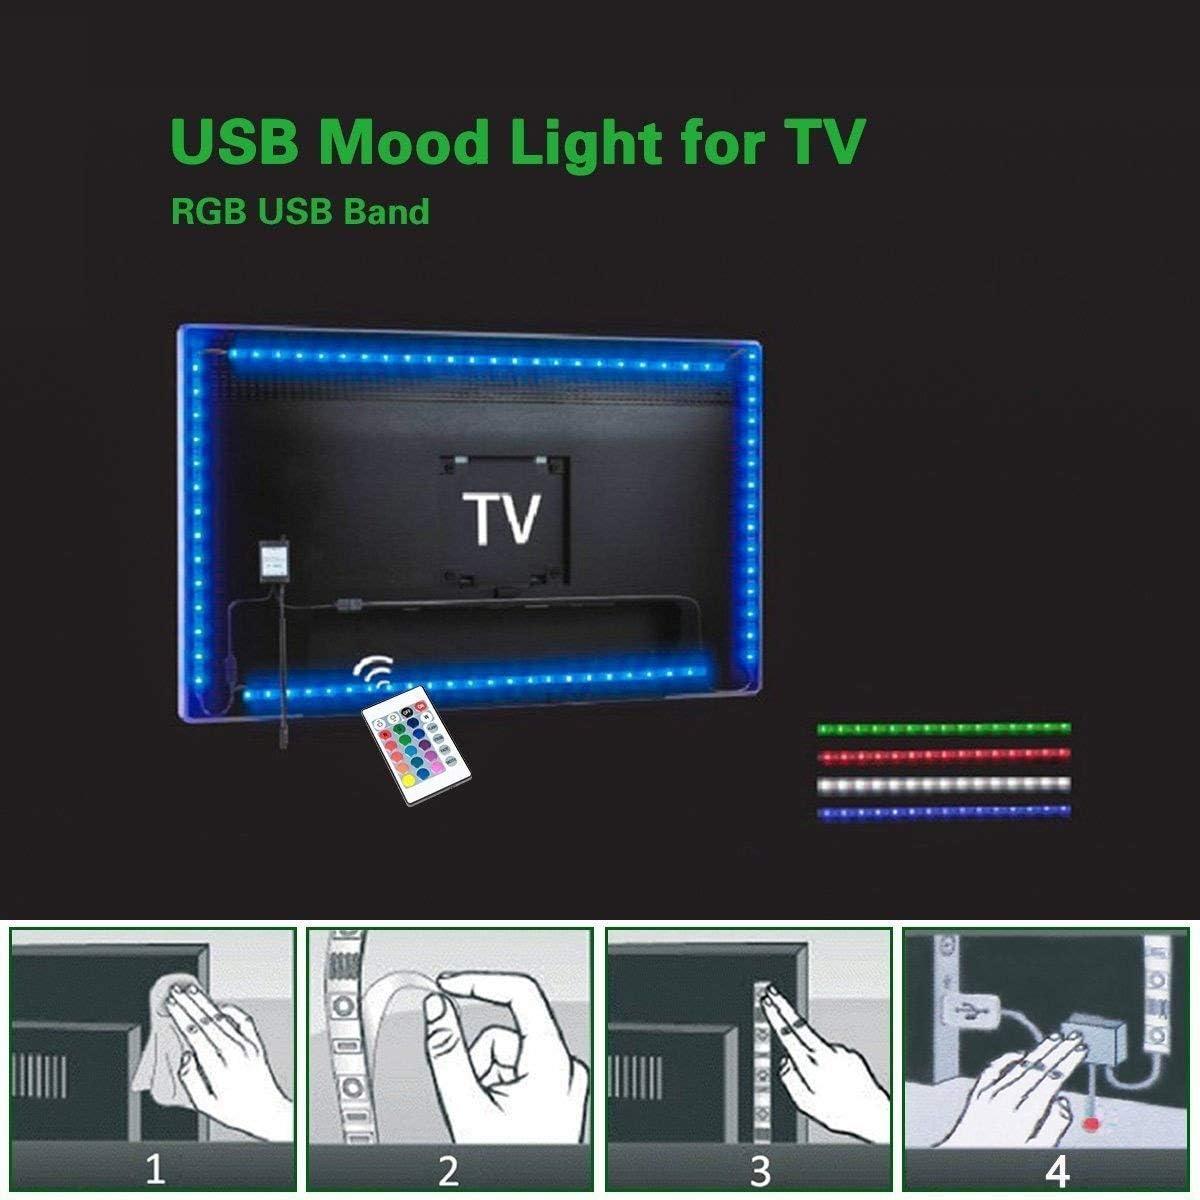 Minger USB Tira LED Luz 2*1.64ft+2*3.2ft 5050 RGB TV ambiente de iluminación +Mini Mando Control Remoto de 44 Botones: Amazon.es: Hogar